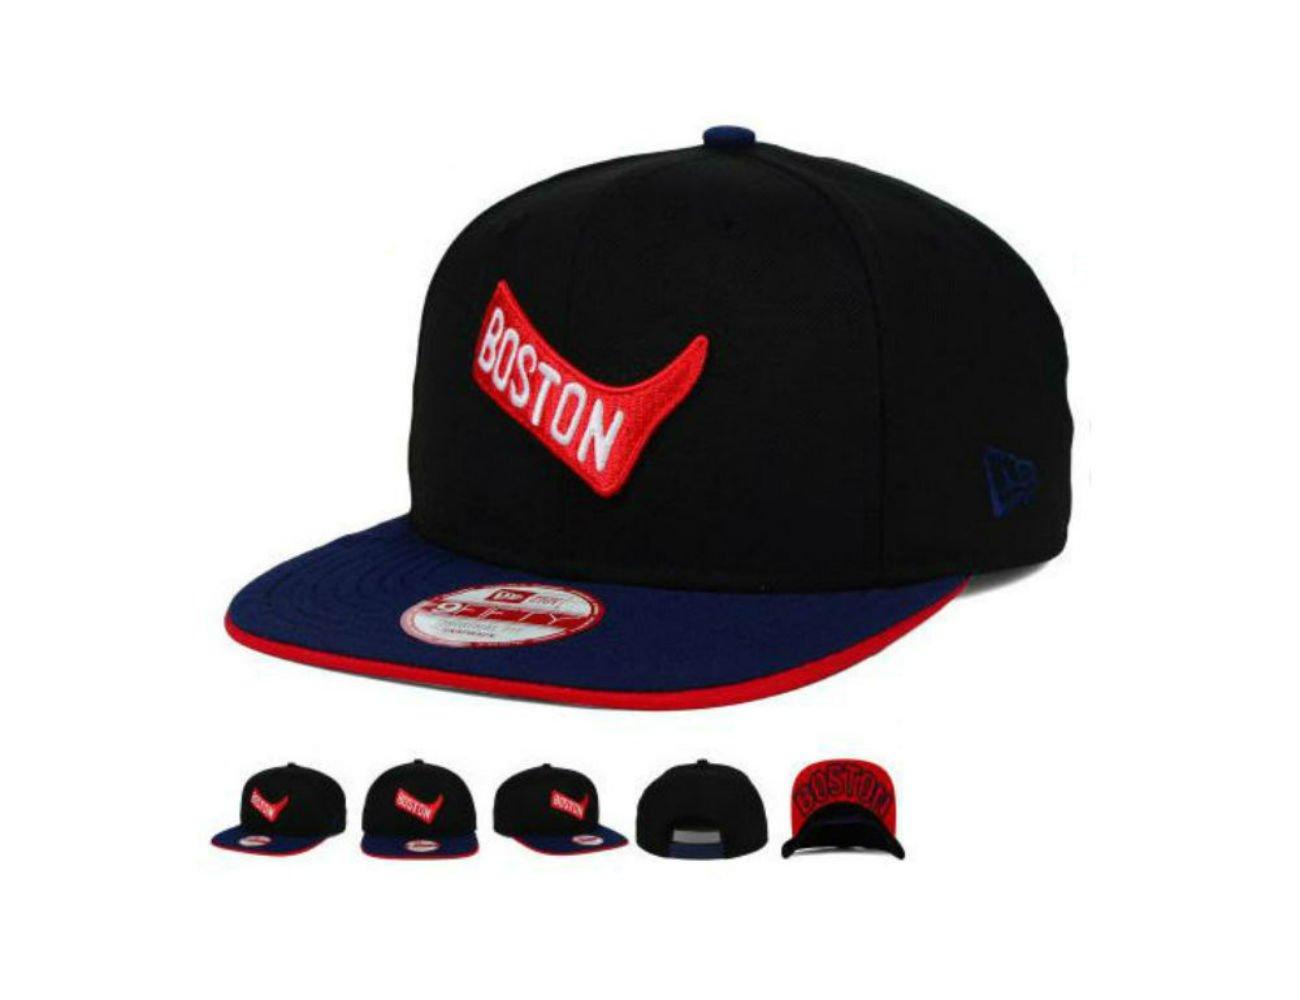 Amazon.com   New Era Boston Red Sox Snapback Adjustable Vintage Logo Hat  Cap Black   Navy   Sports   Outdoors 073b969f91e